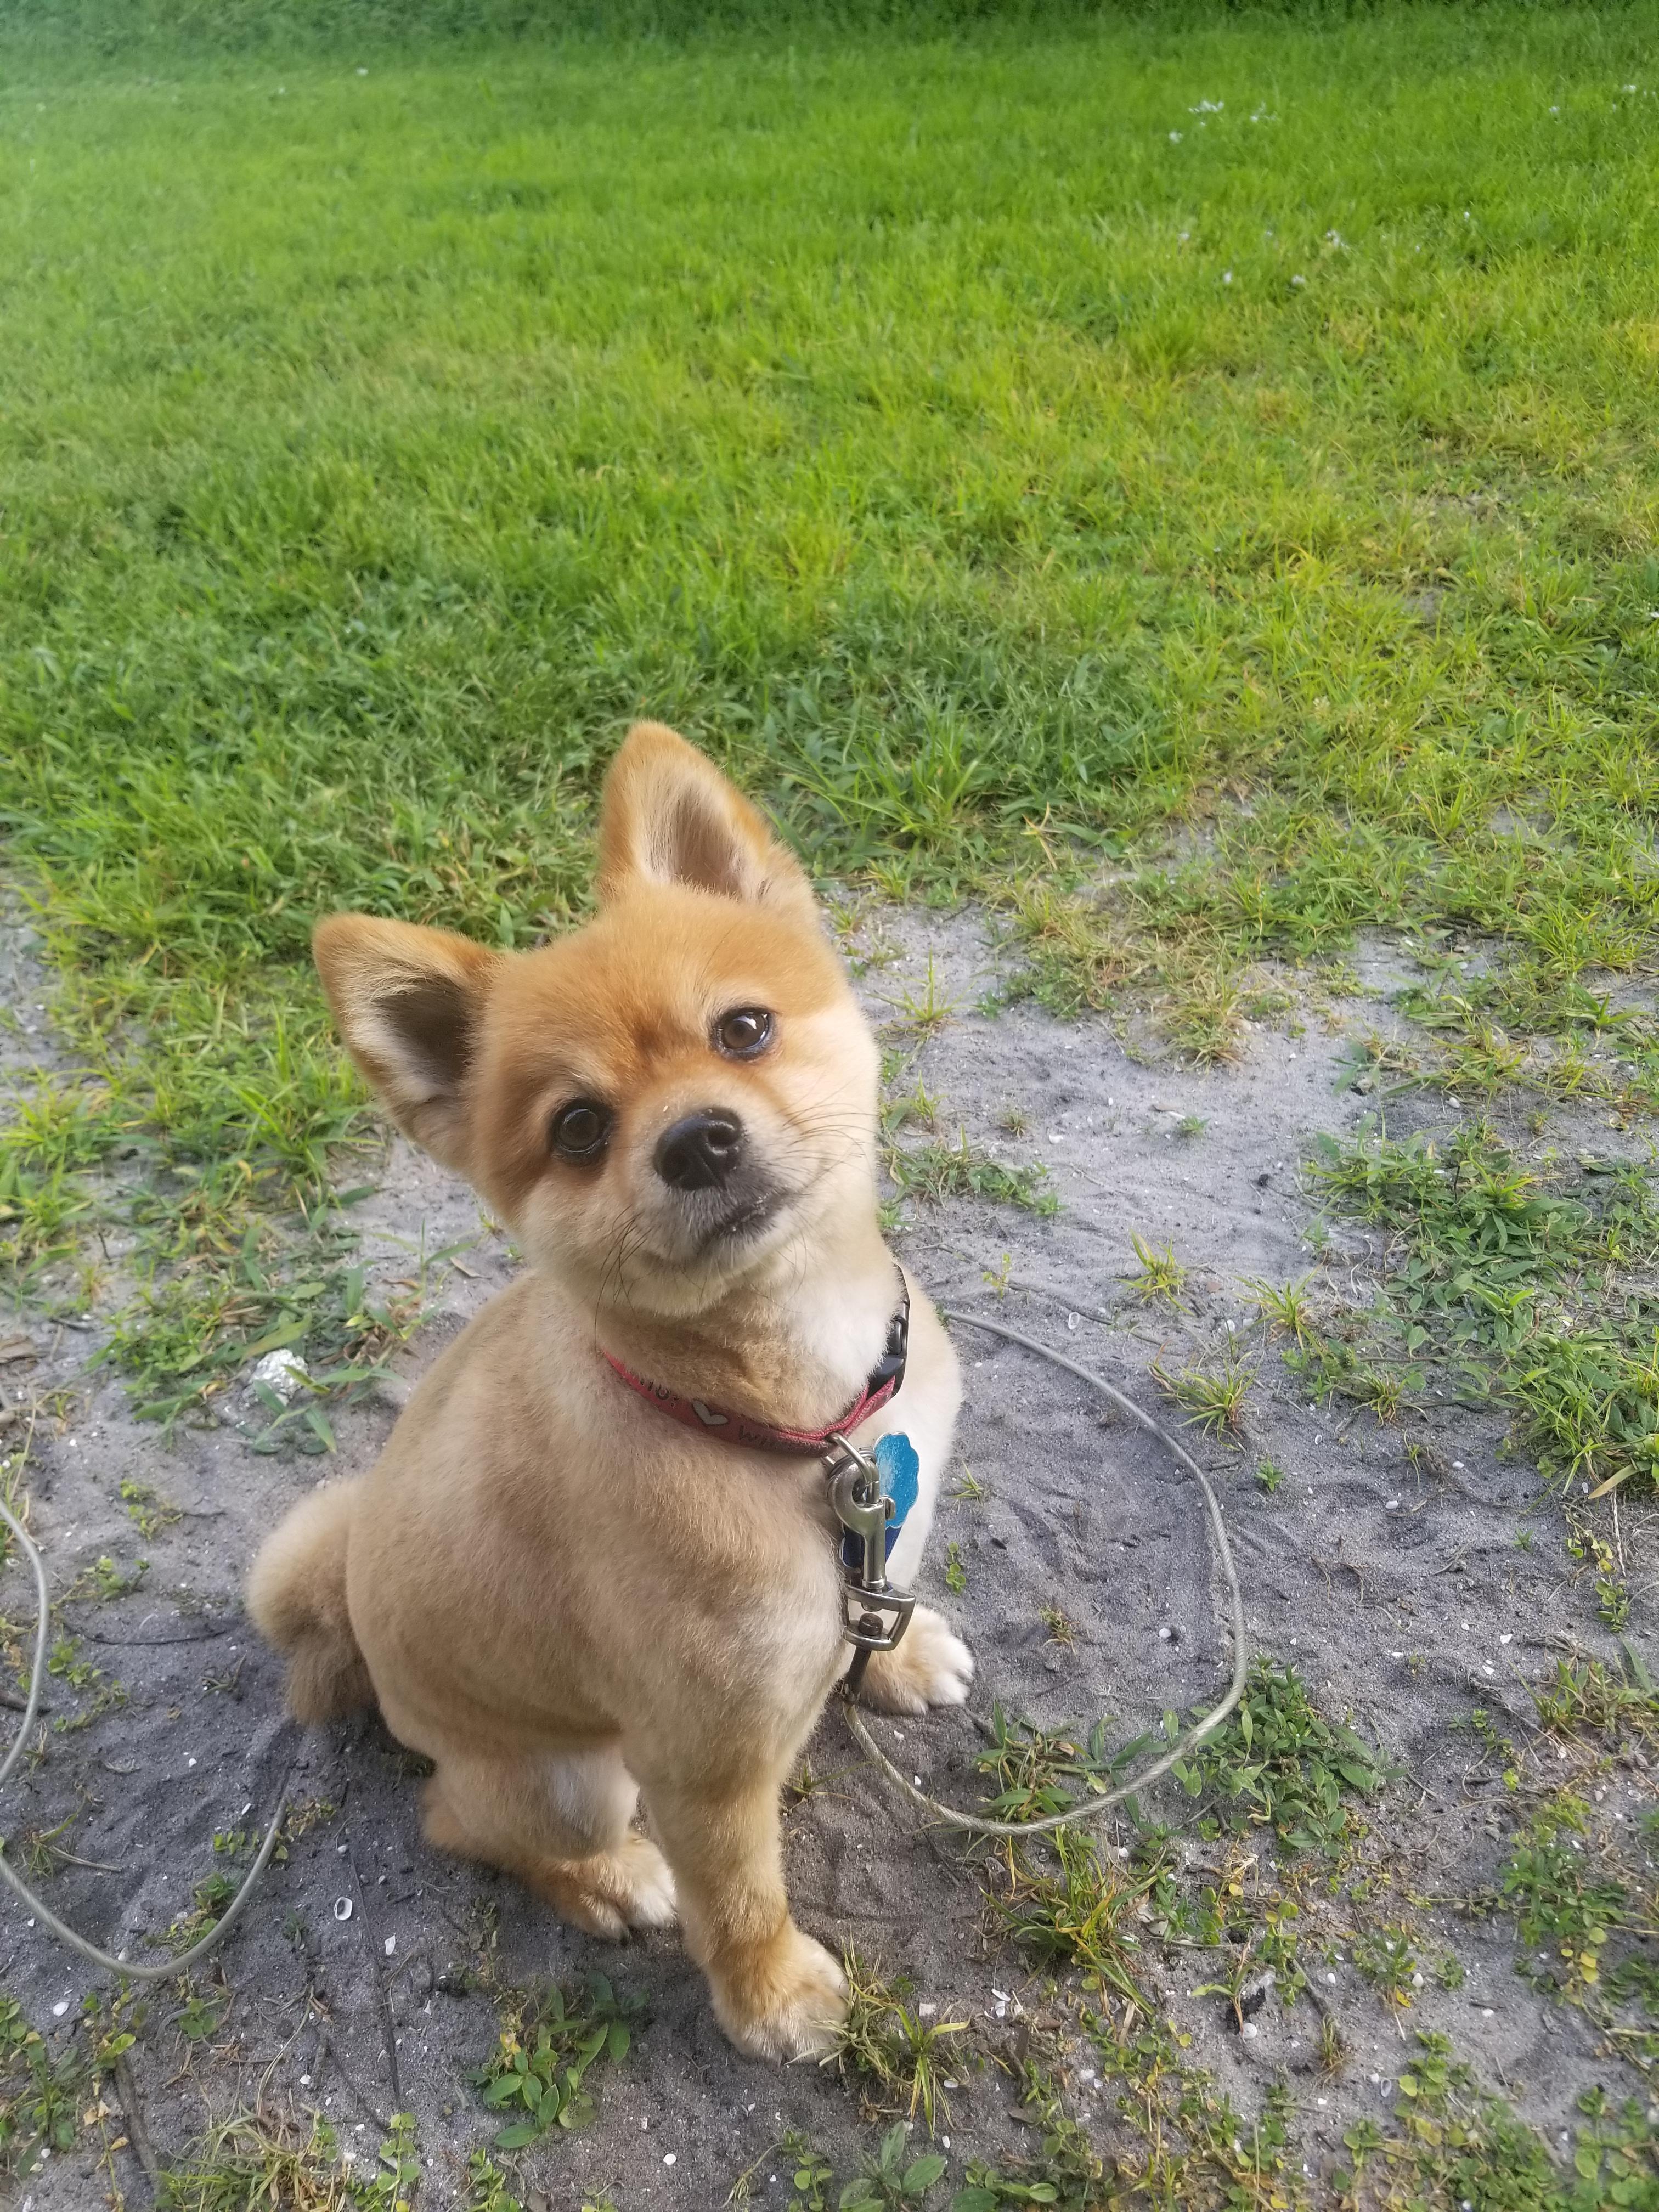 Pomeranian Short Haircut : pomeranian, short, haircut, Handsome, Pomeranian, Short...and, Relieved, Heat!, Reddit,, Grizz!